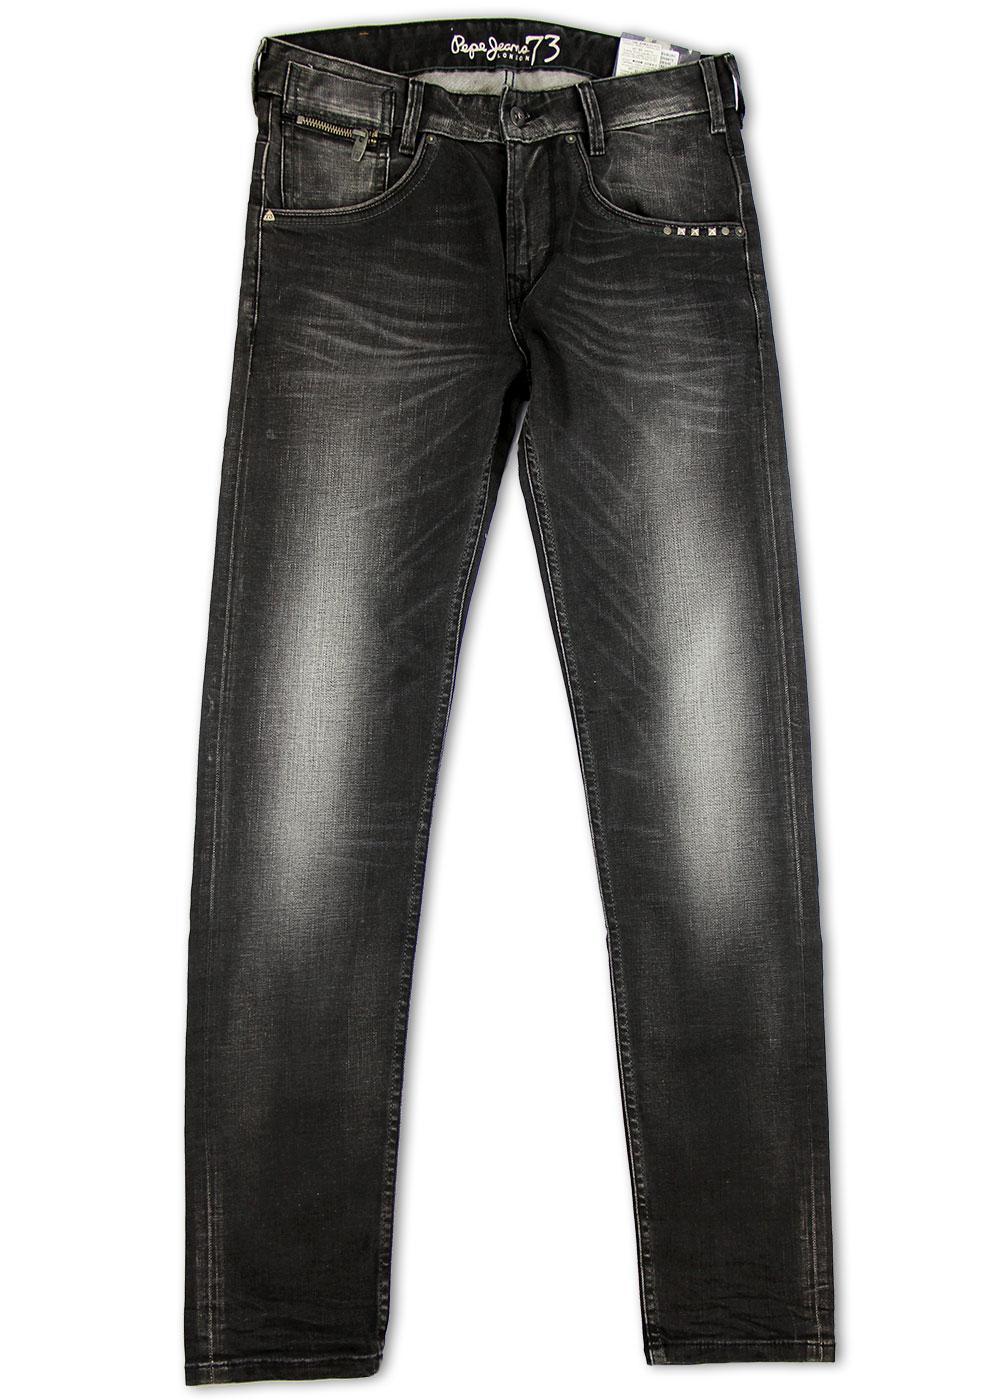 Tenbury PEPE JEANS Retro Slim Jeans with Stud Trim